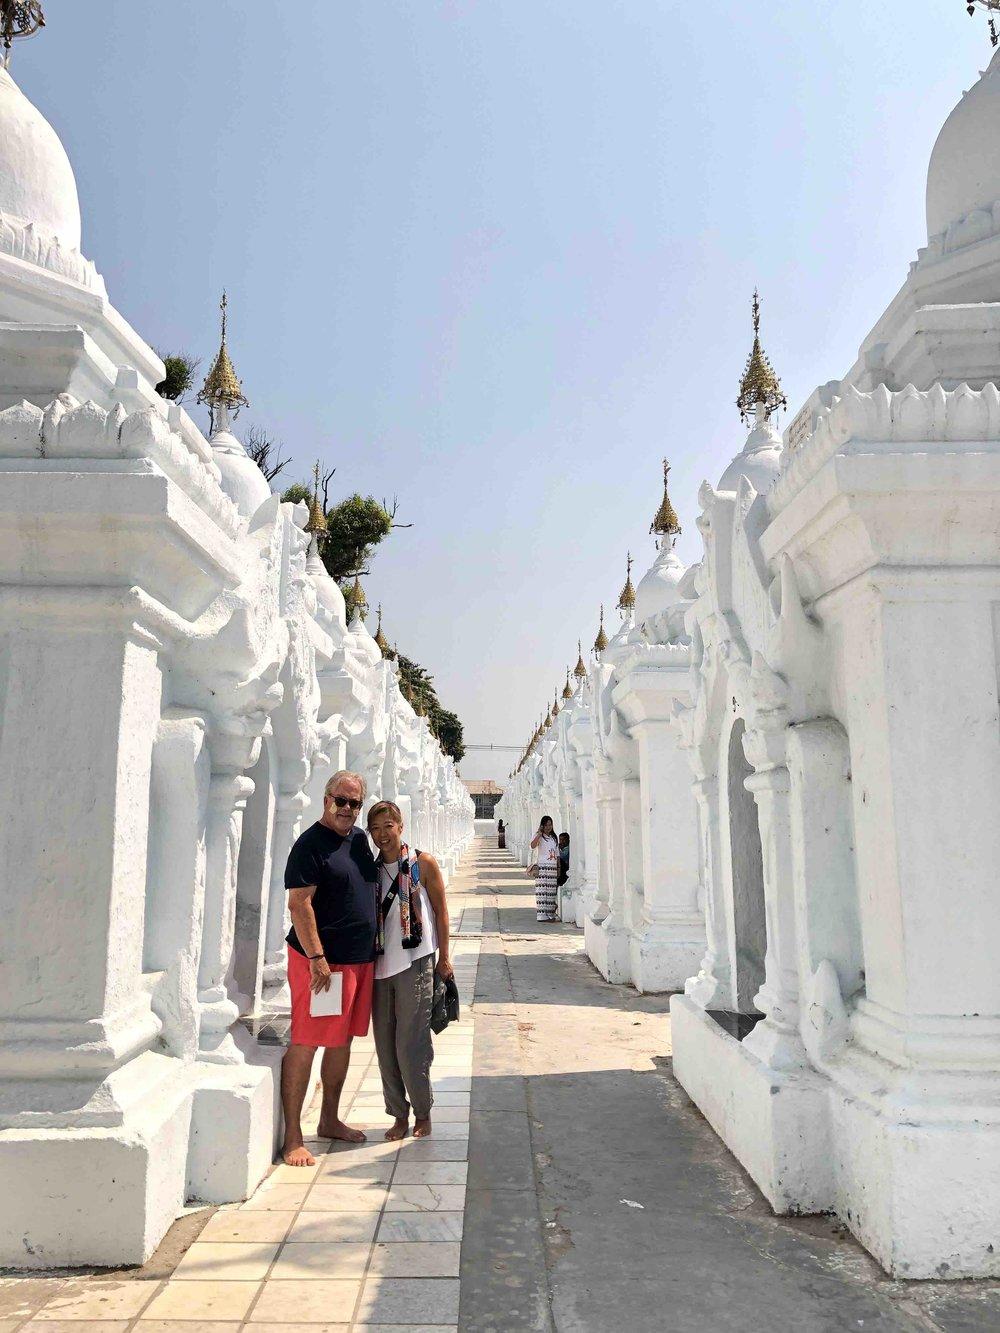 Shwe in Bein Monastery